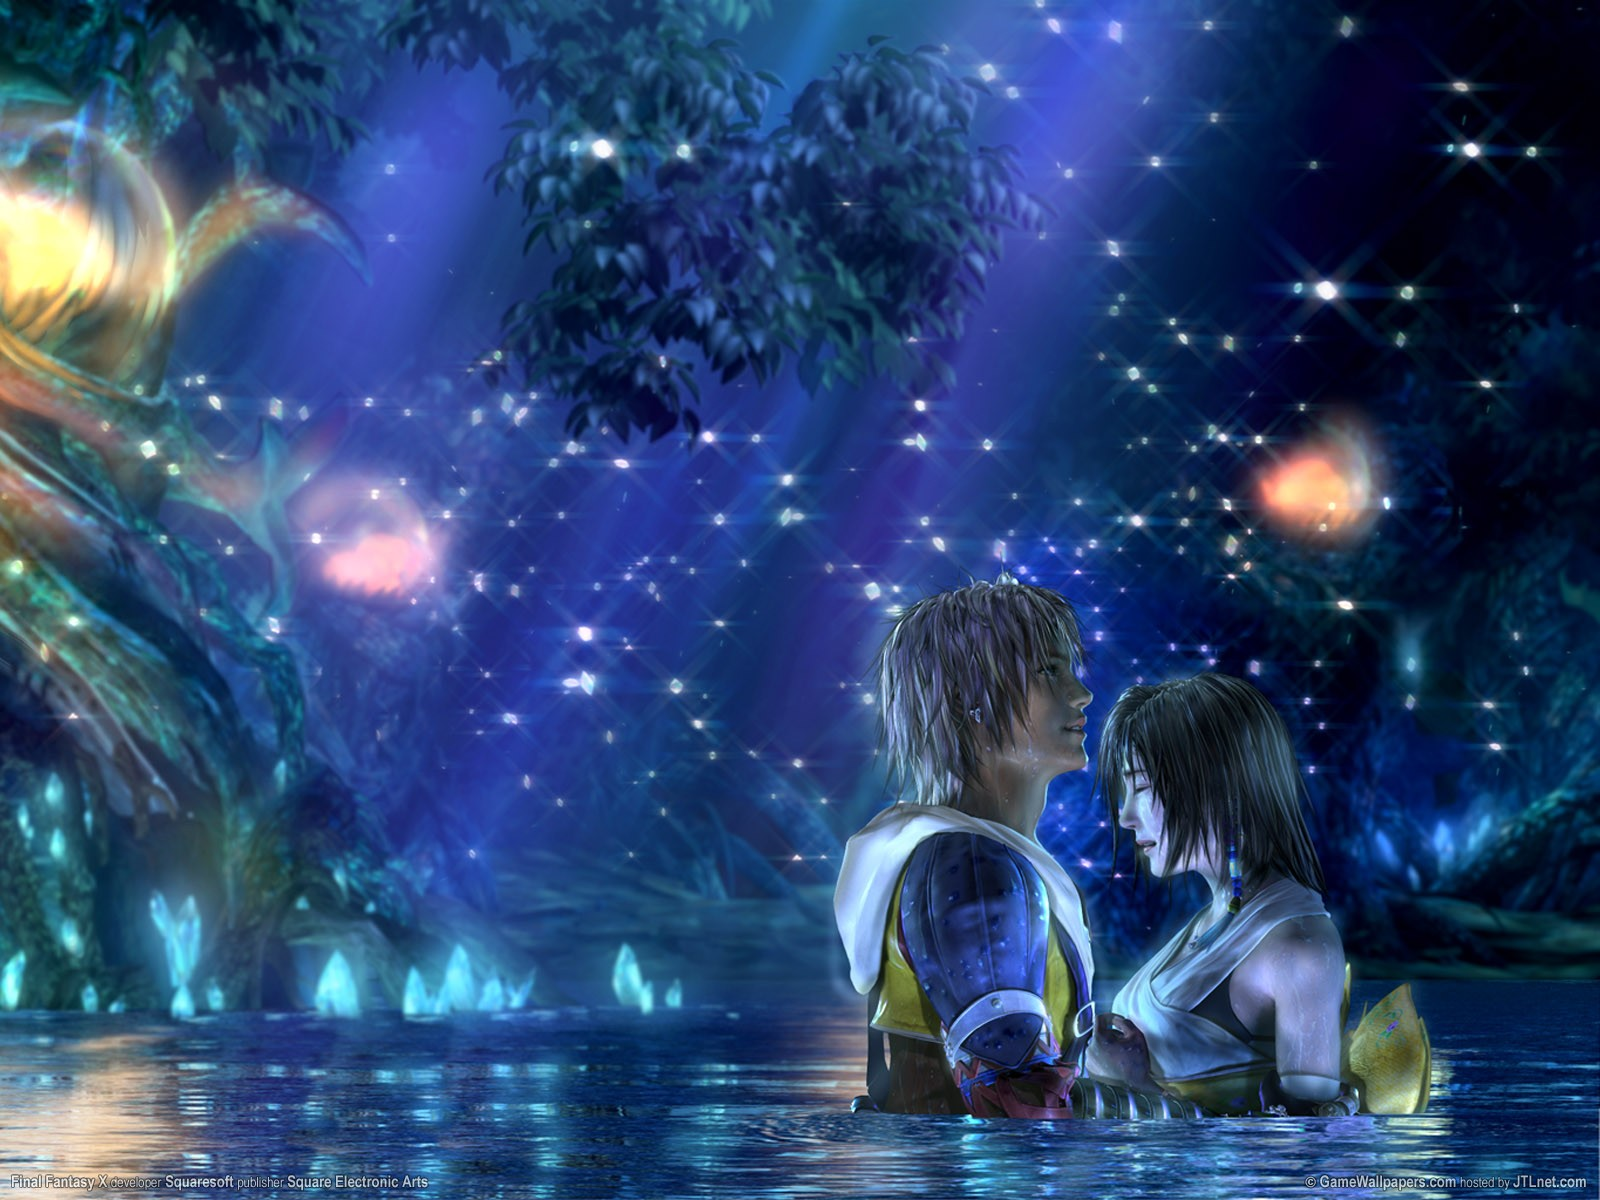 Fantasy Backgrounds for